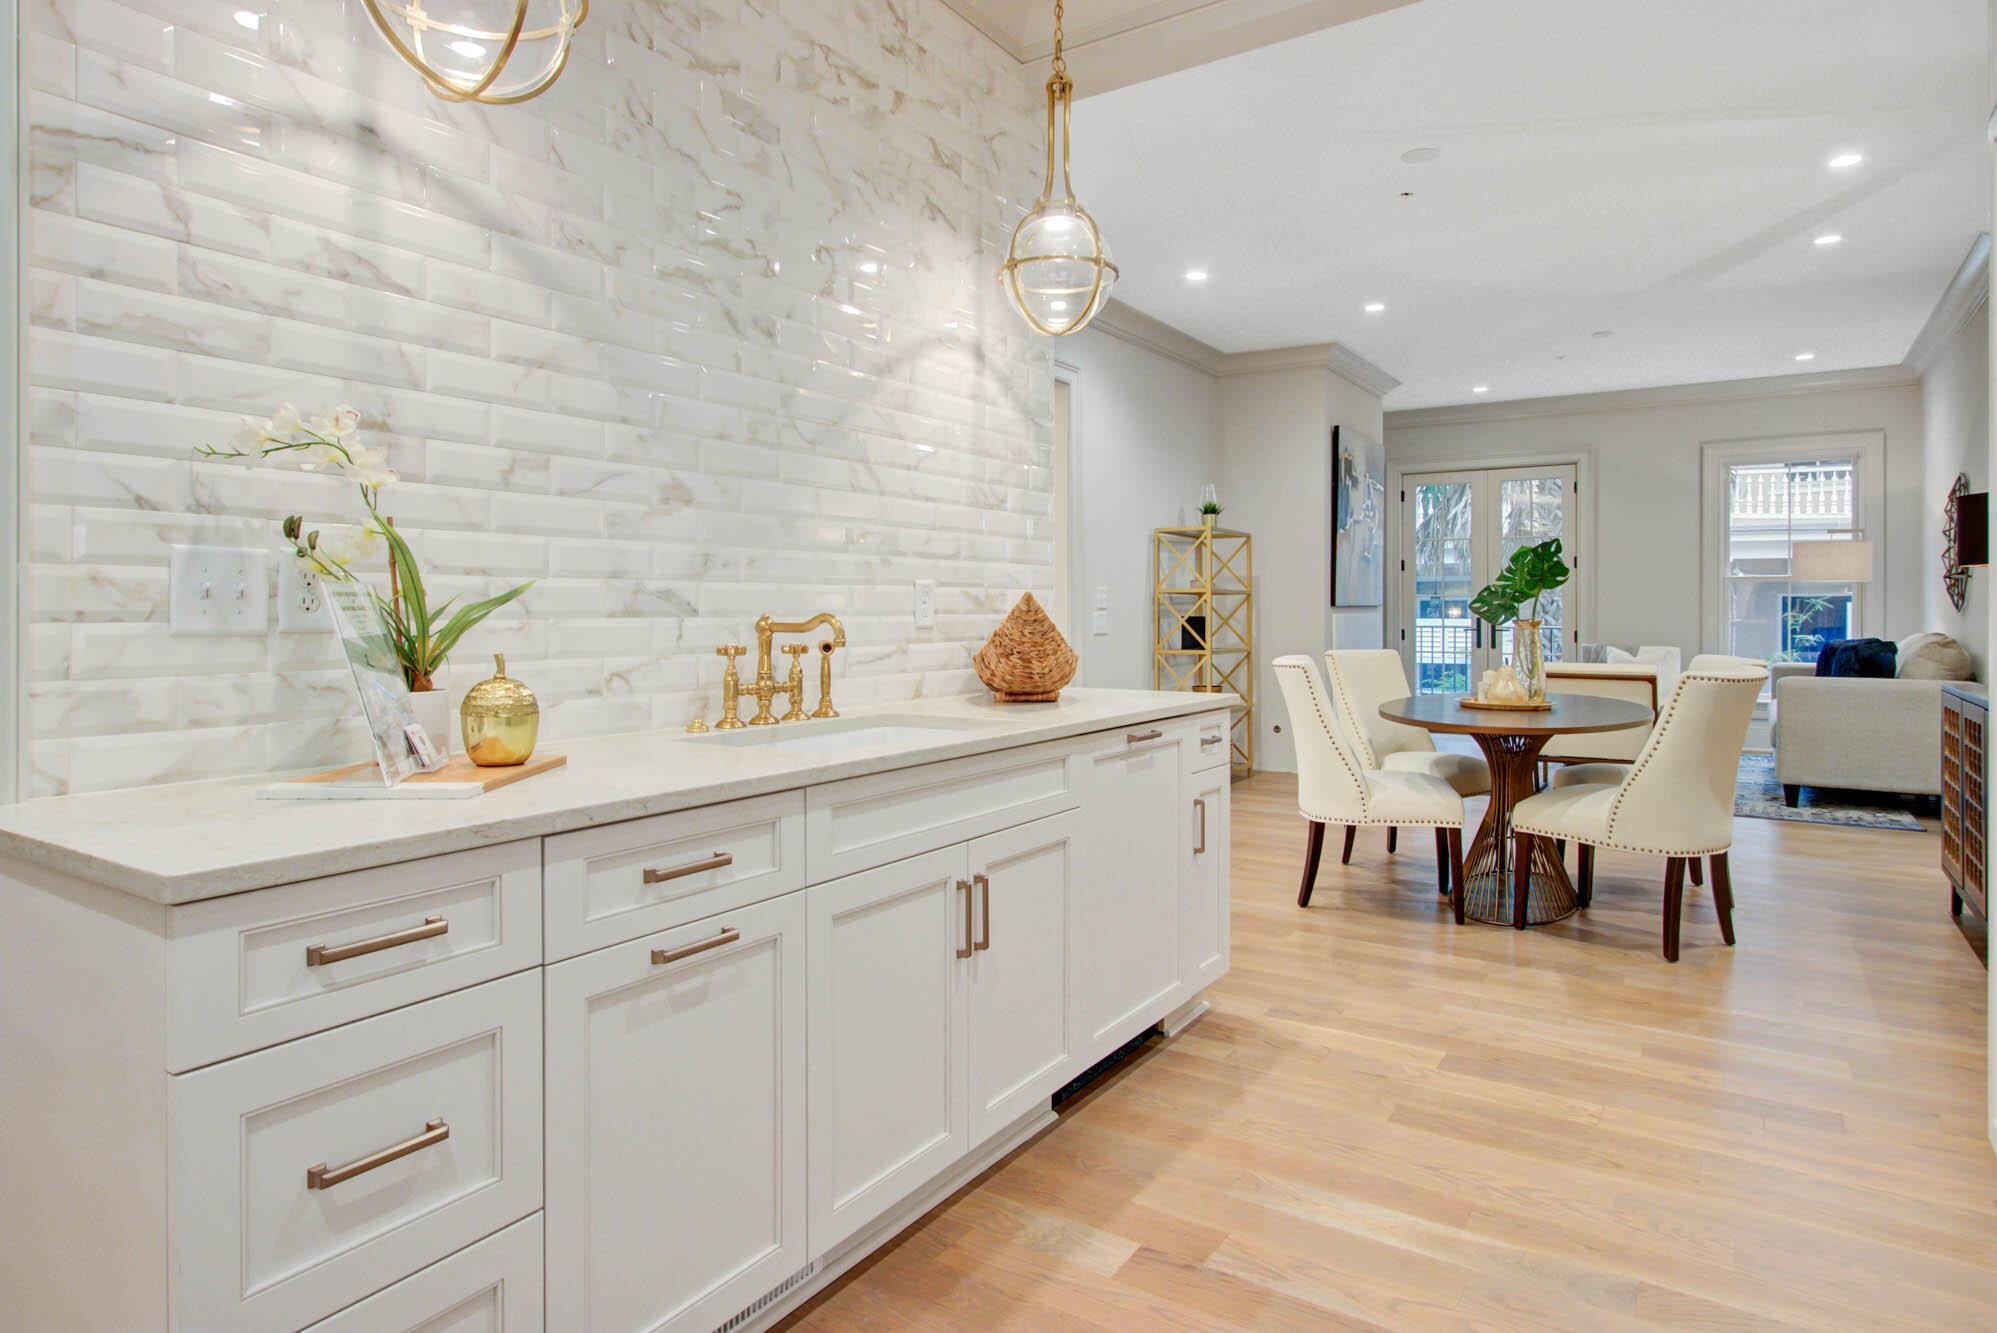 Harleston Village Homes For Sale - 31 Smith, Charleston, SC - 37